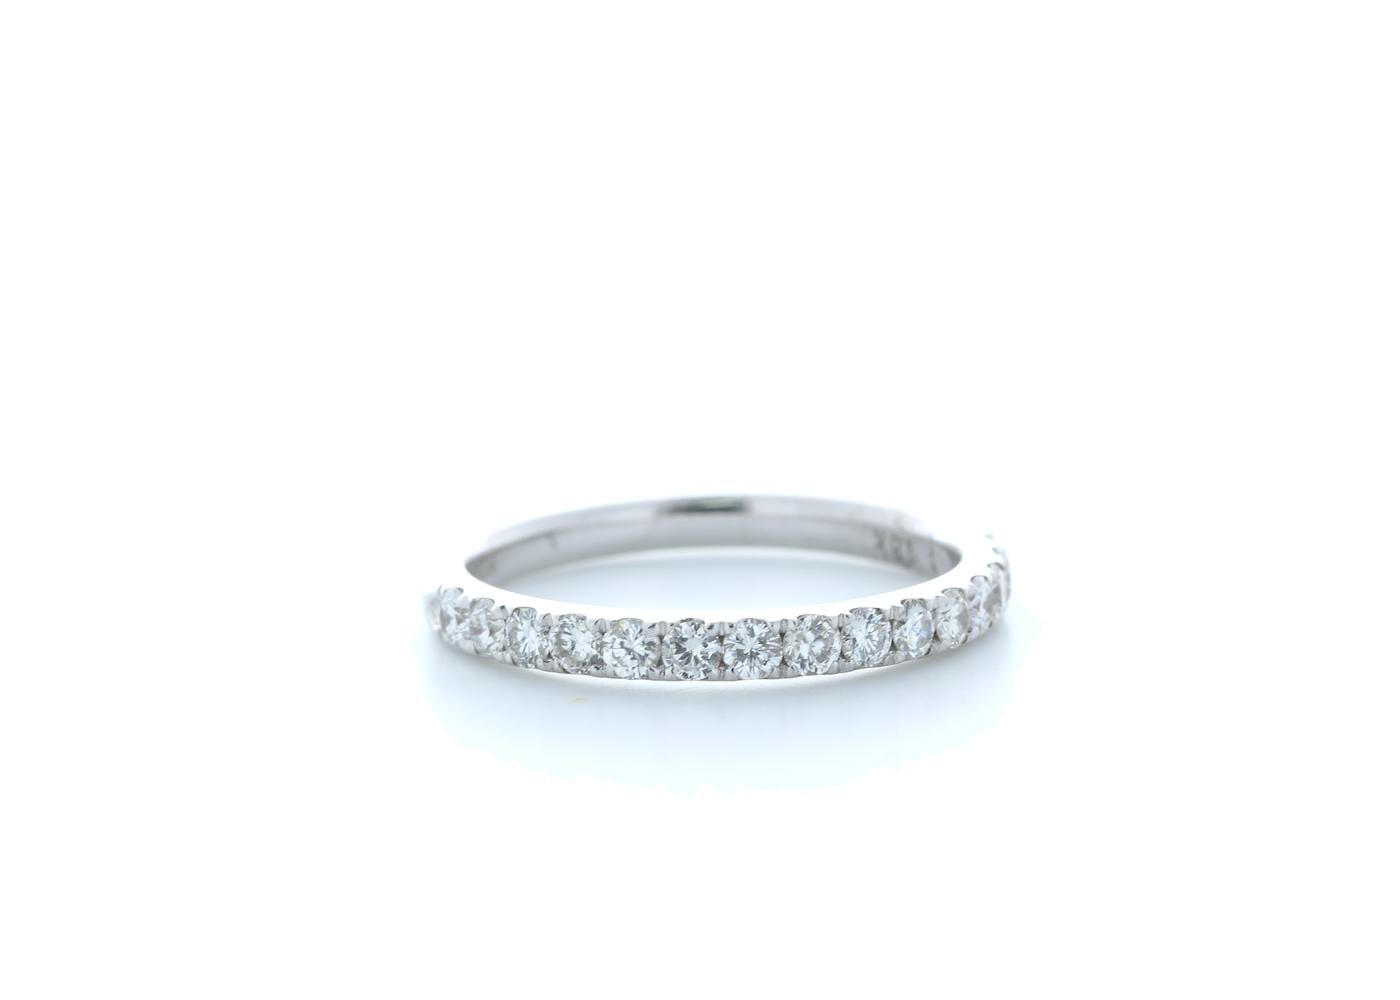 18ct White Gold Claw Set Semi Eternity Diamond Ring 0.35 Carats